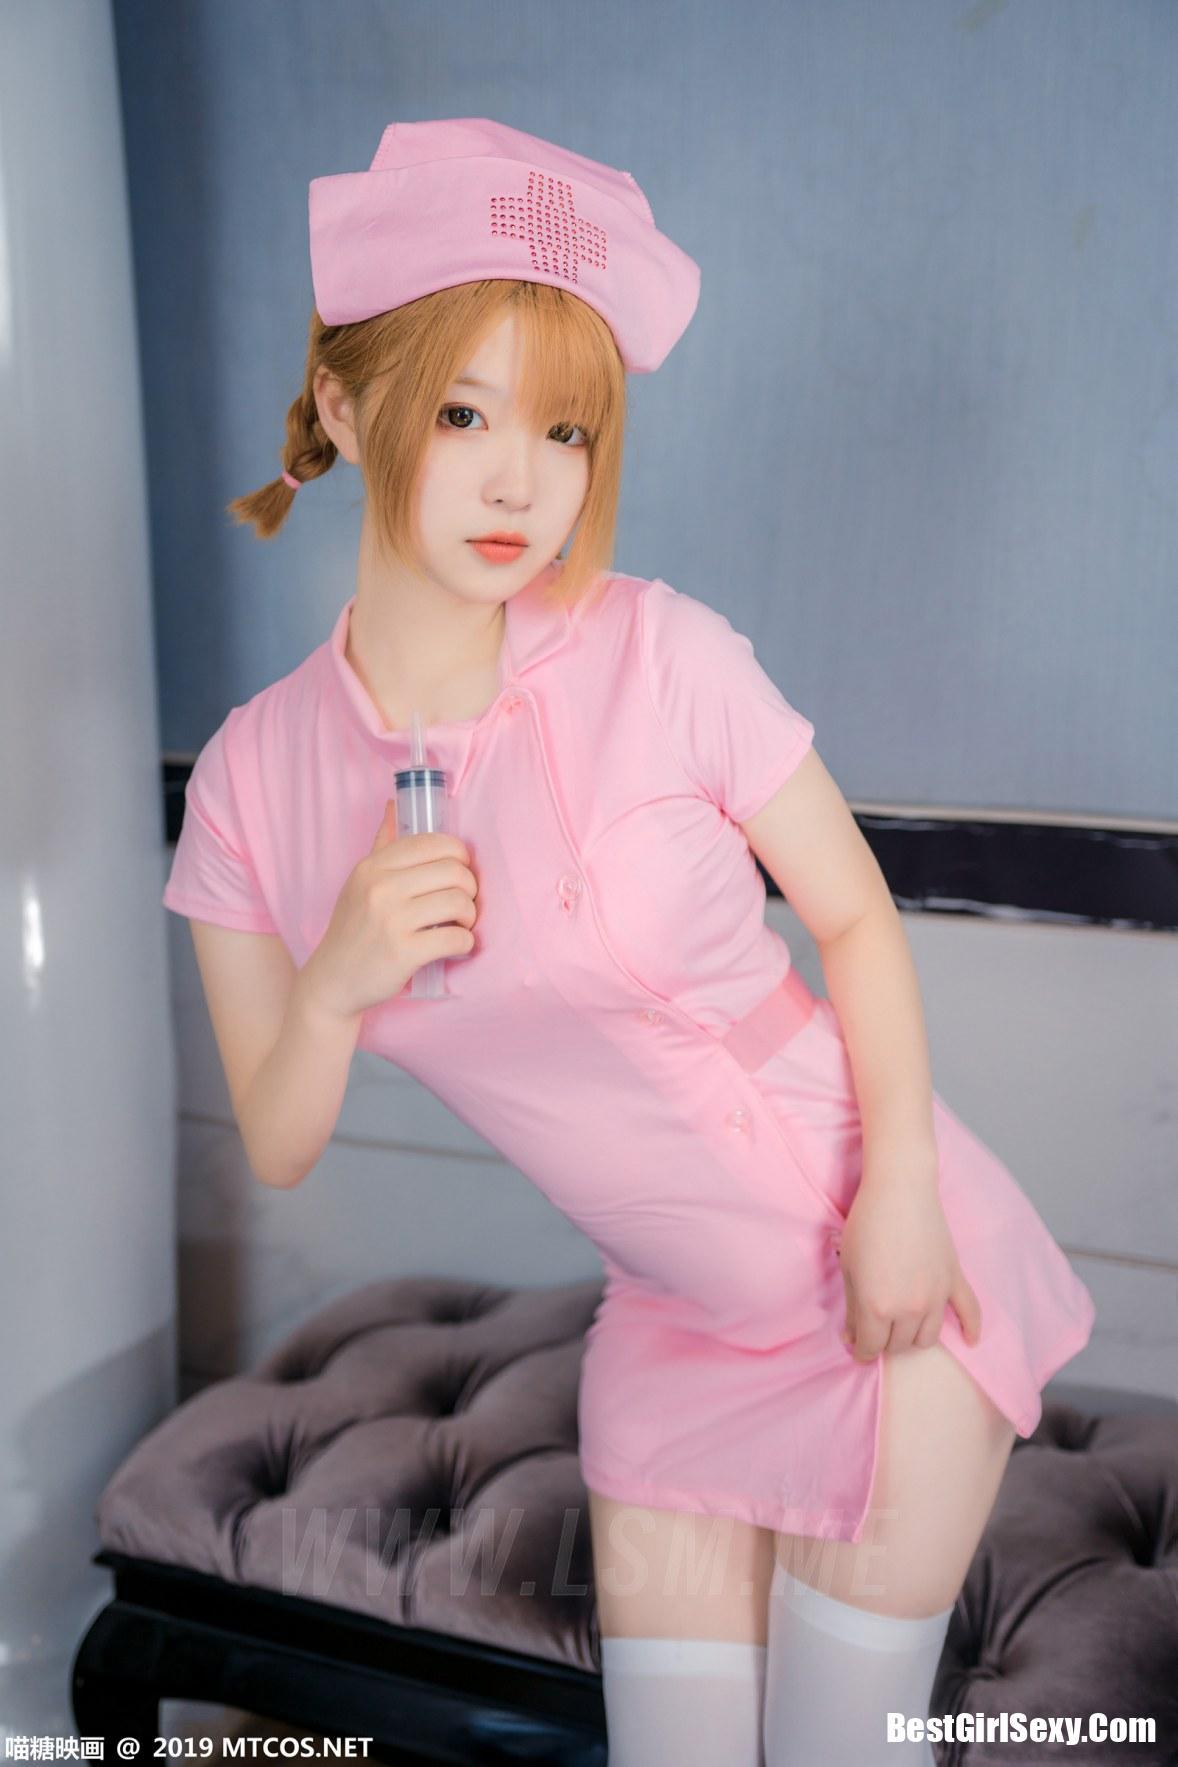 Sexy little nurse cute, MTYH Vol.071 Sexy little nurse cute, MTYH Vol.071